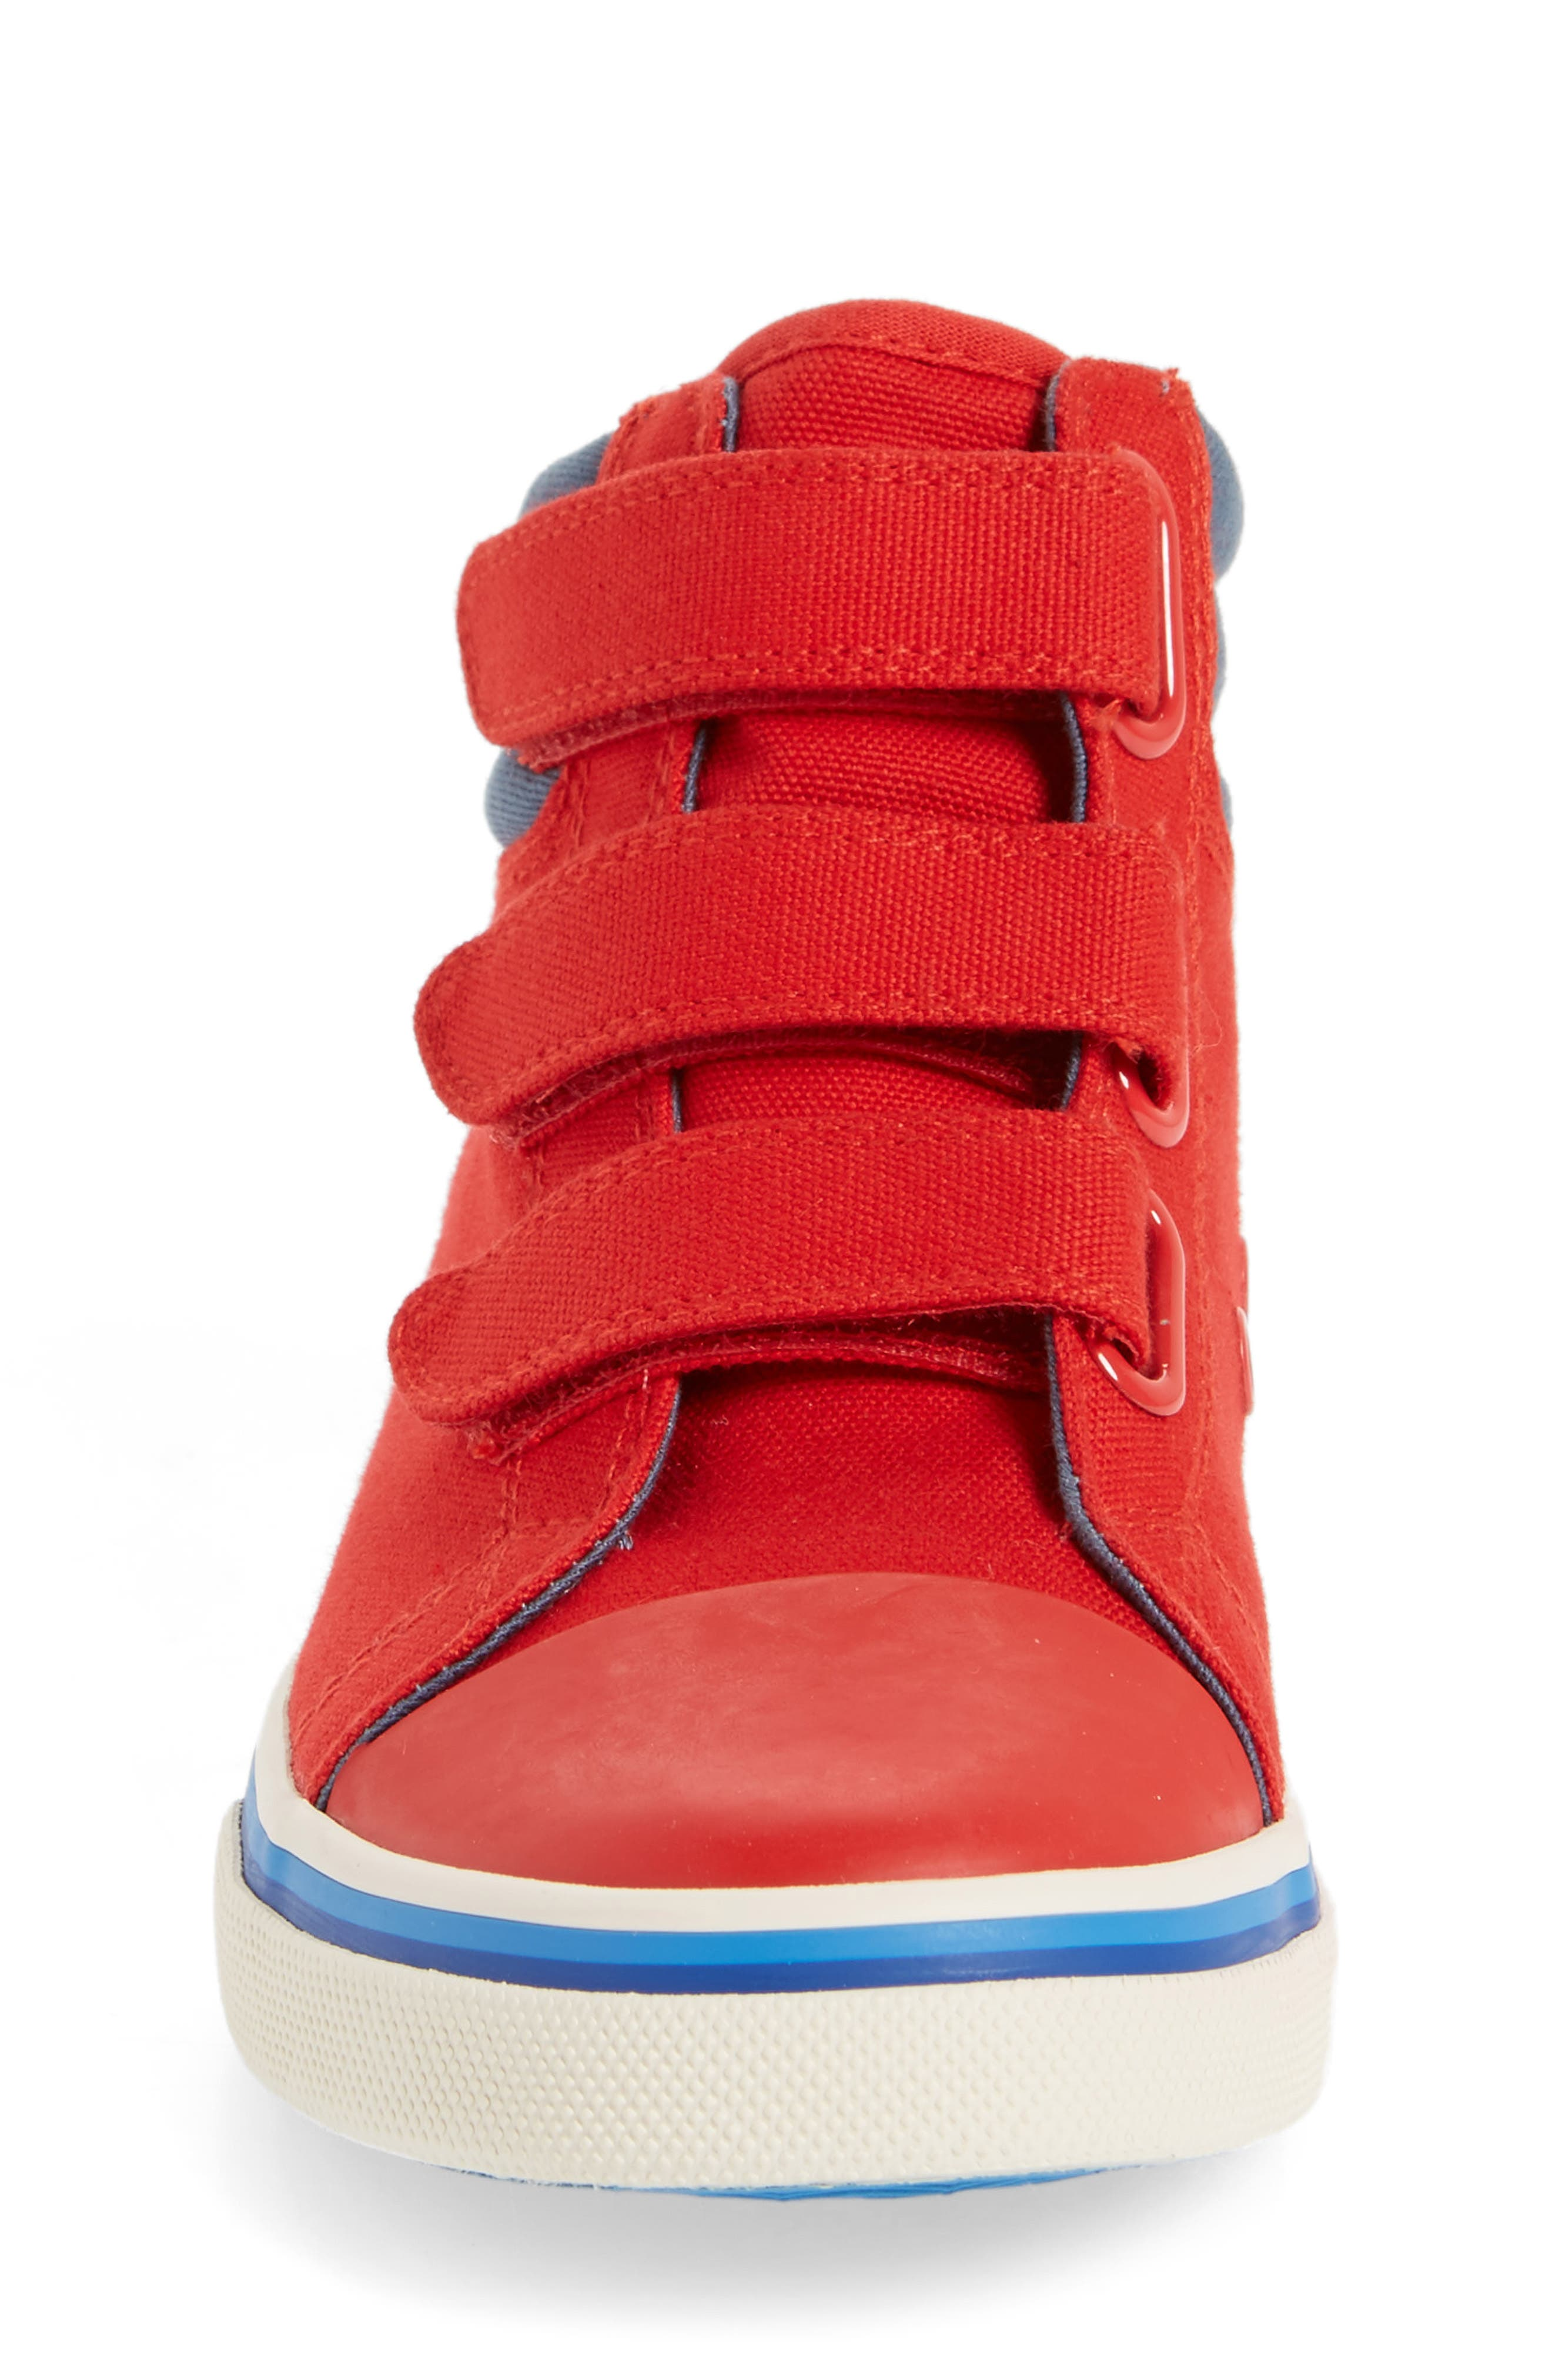 High Top Sneaker,                             Alternate thumbnail 4, color,                             614